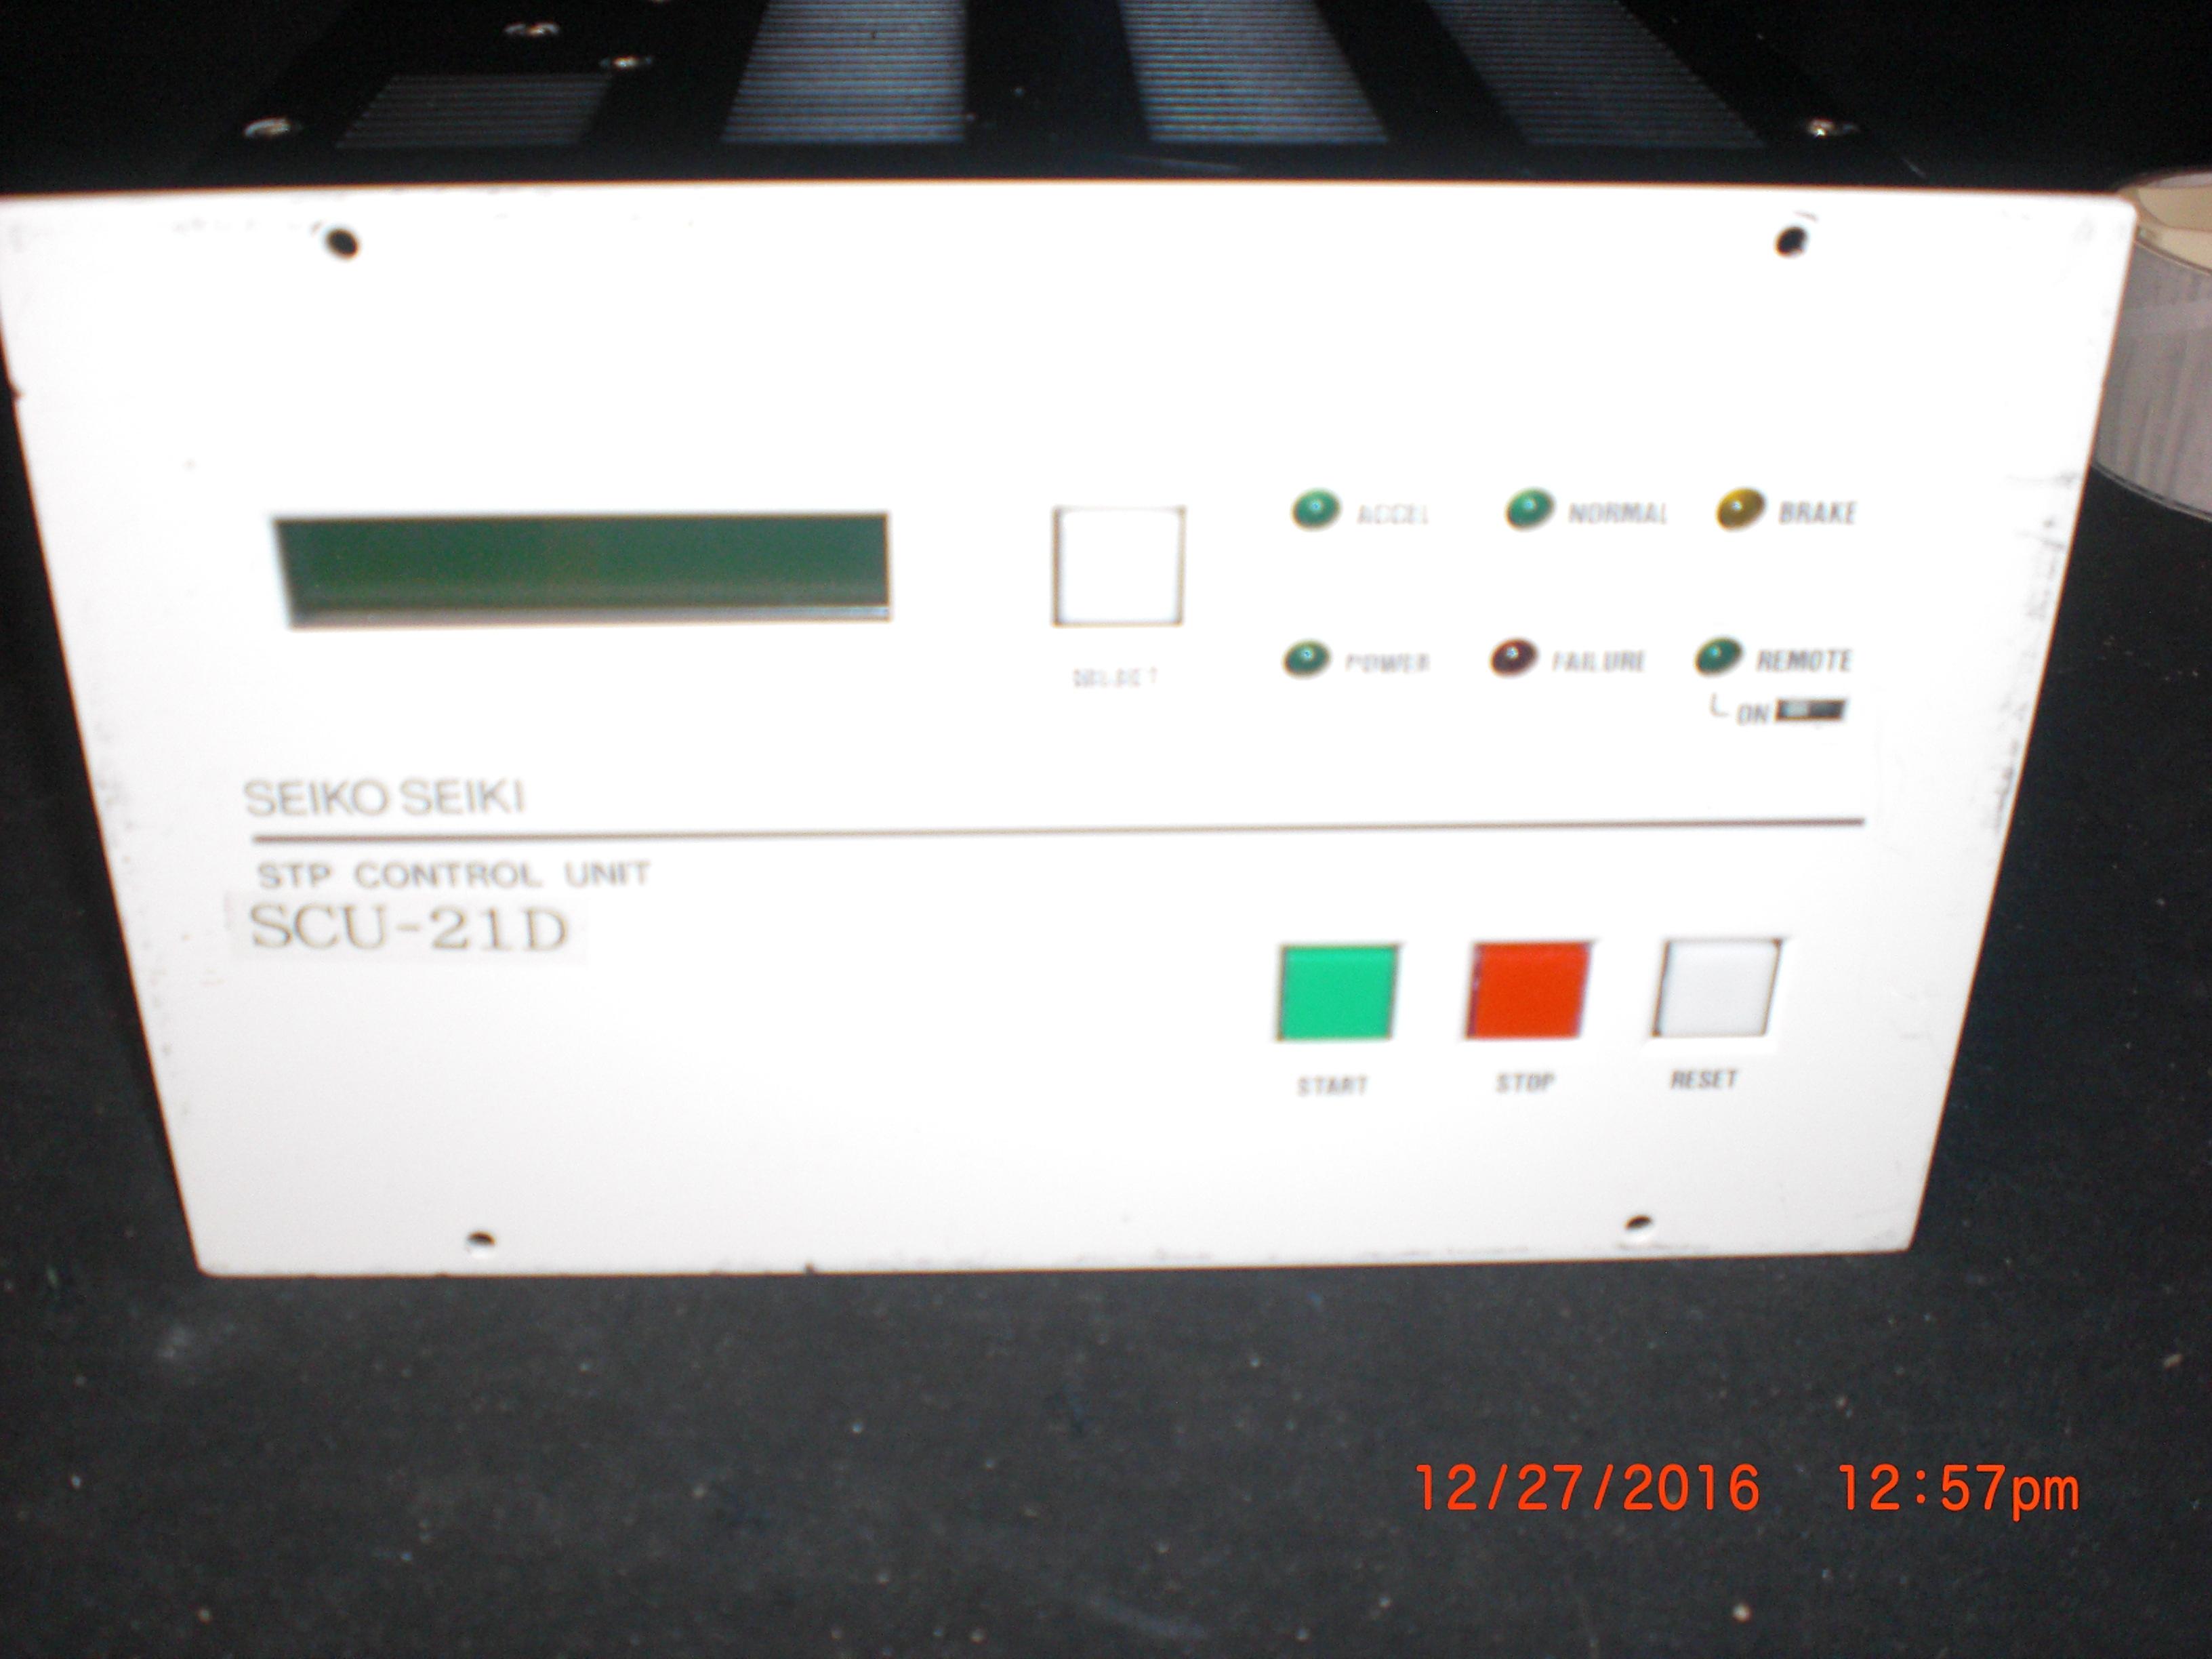 Controller SEIKO SEIKI SCD-21D STP Control Unit Turbo Pump